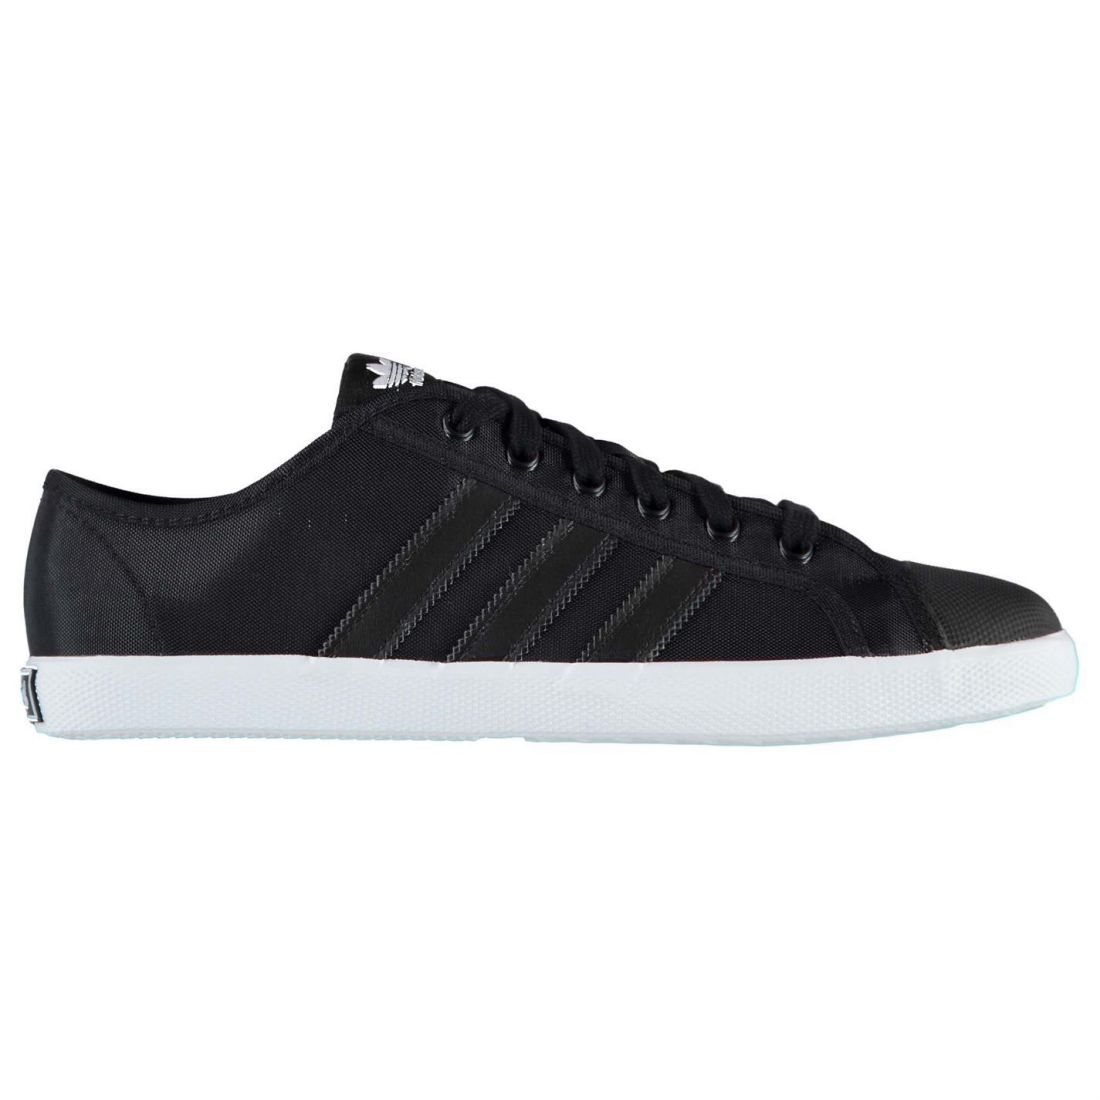 0de62d178ff5 Image is loading adidas-Originals-Mens-San-Remo-Classic-Trainers-Sneakers-